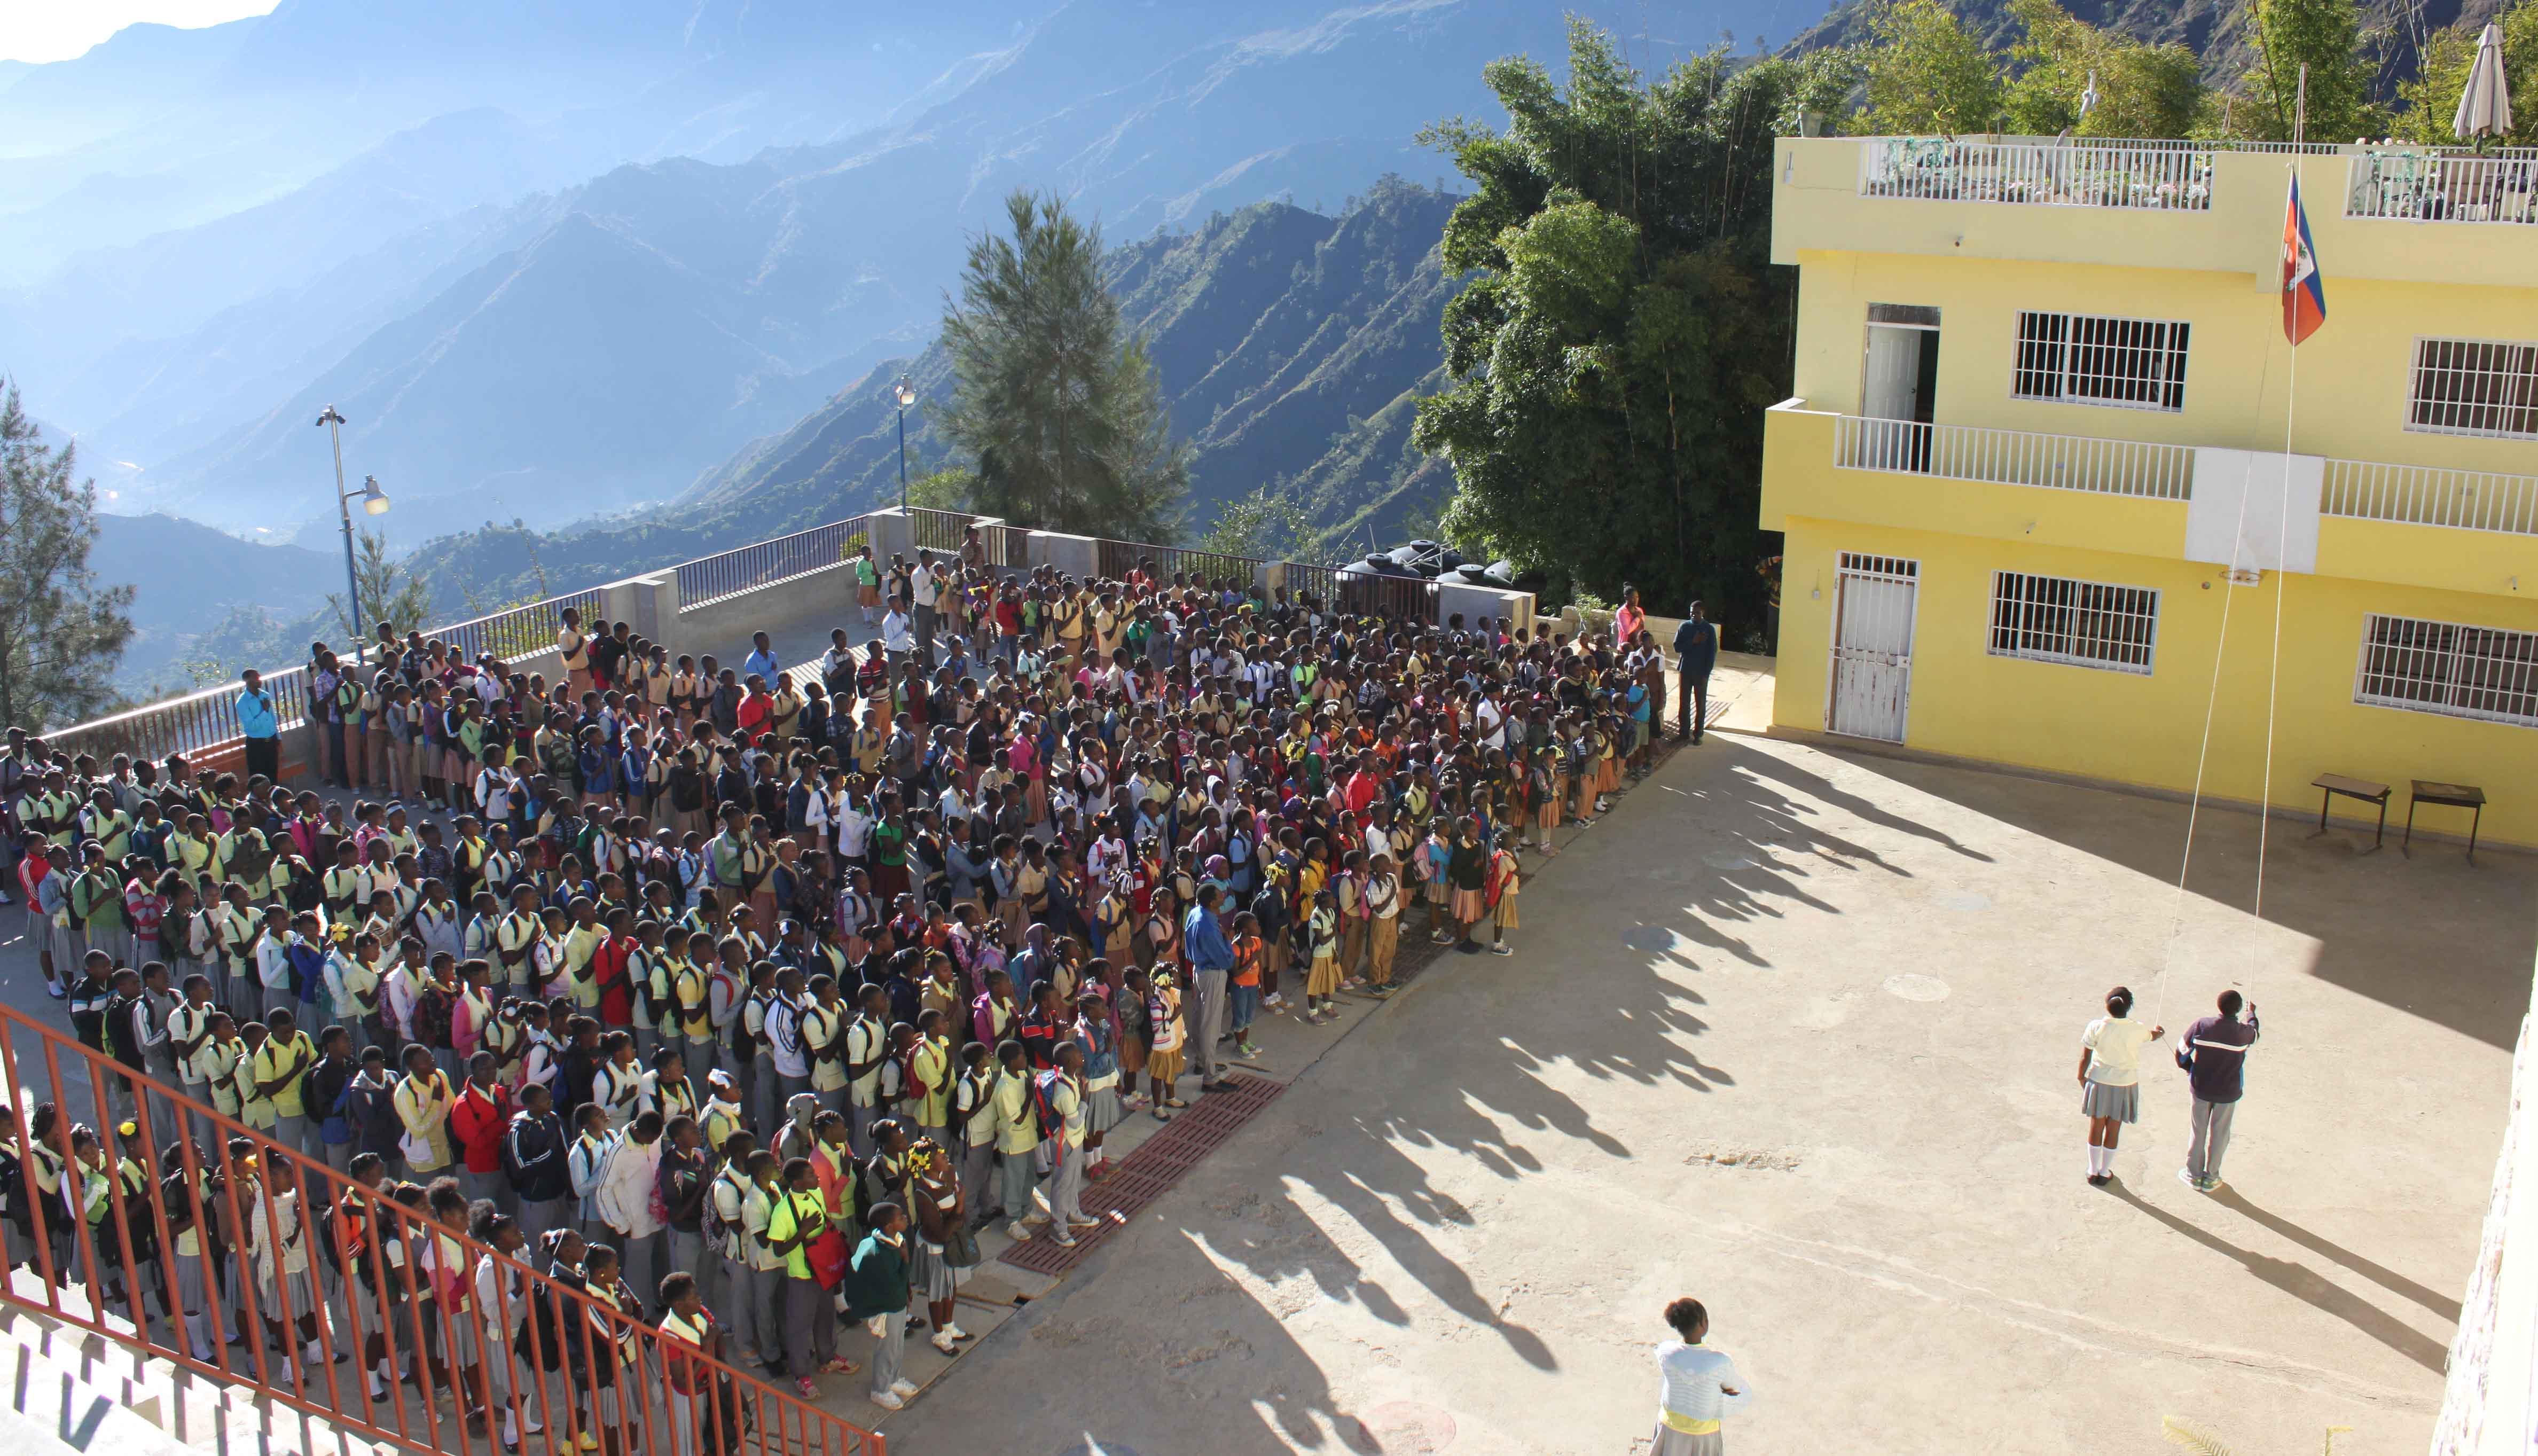 Foundation to School in Haiti